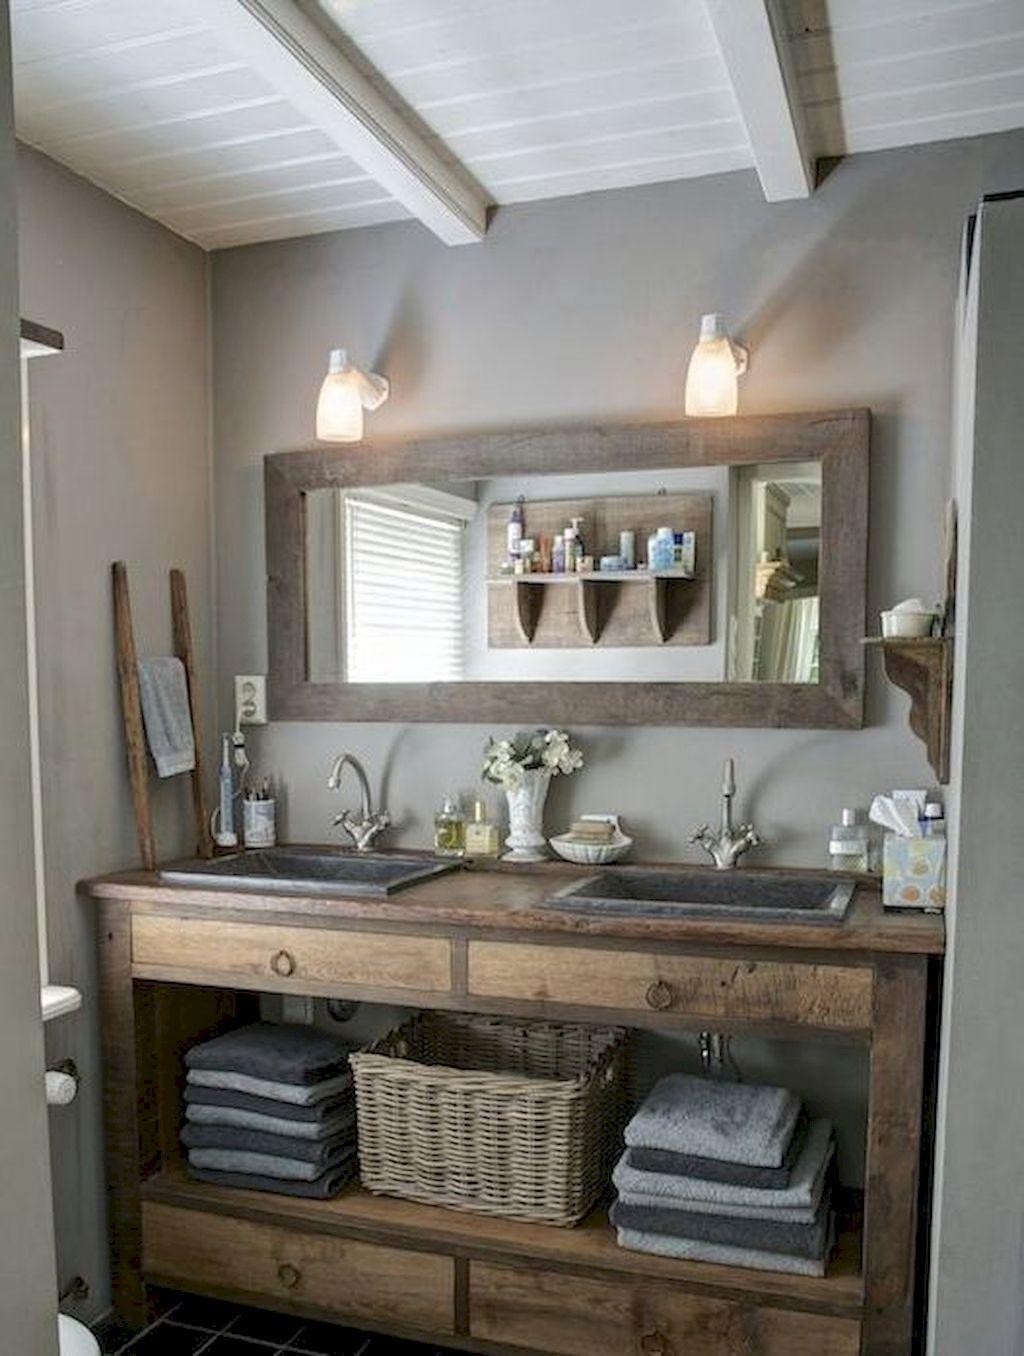 125 Stunning Farmhouse Bathroom Vanity Decor Ideas Rustic Bathroom Remodel Farmhouse Bathroom Decor Bathroom Vanity Decor